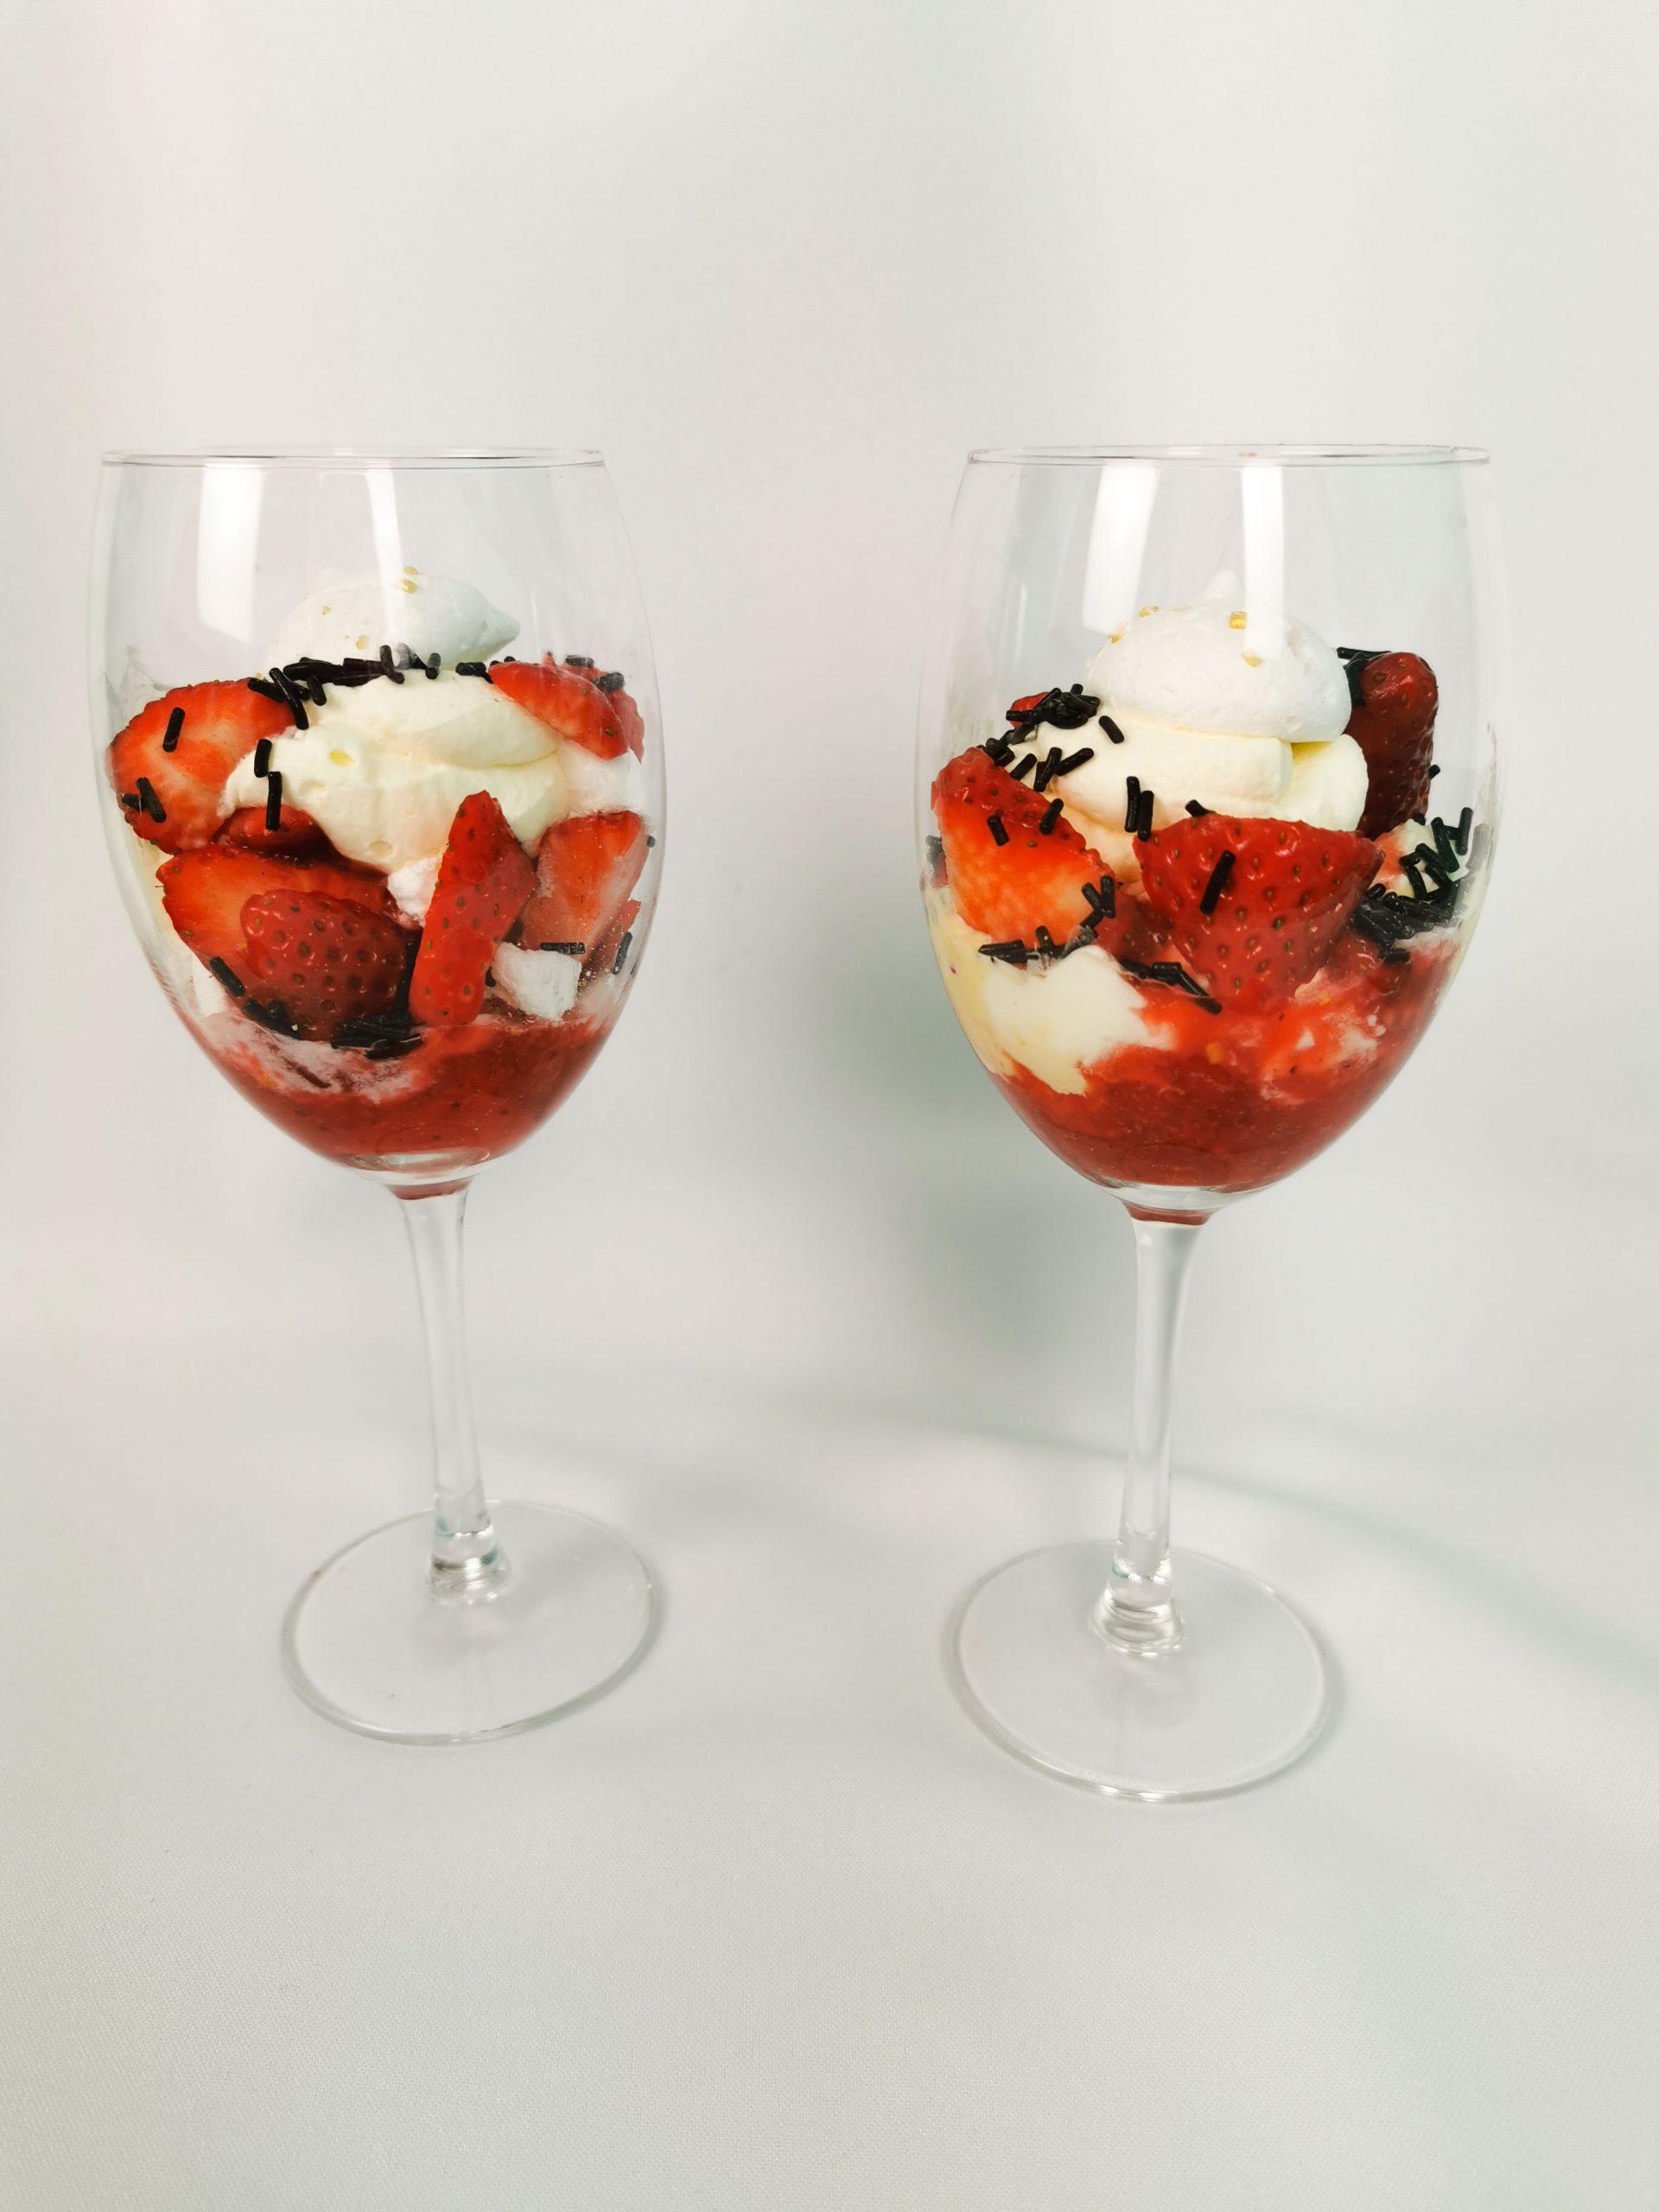 eton mess met aardbeien, ijs en meringue